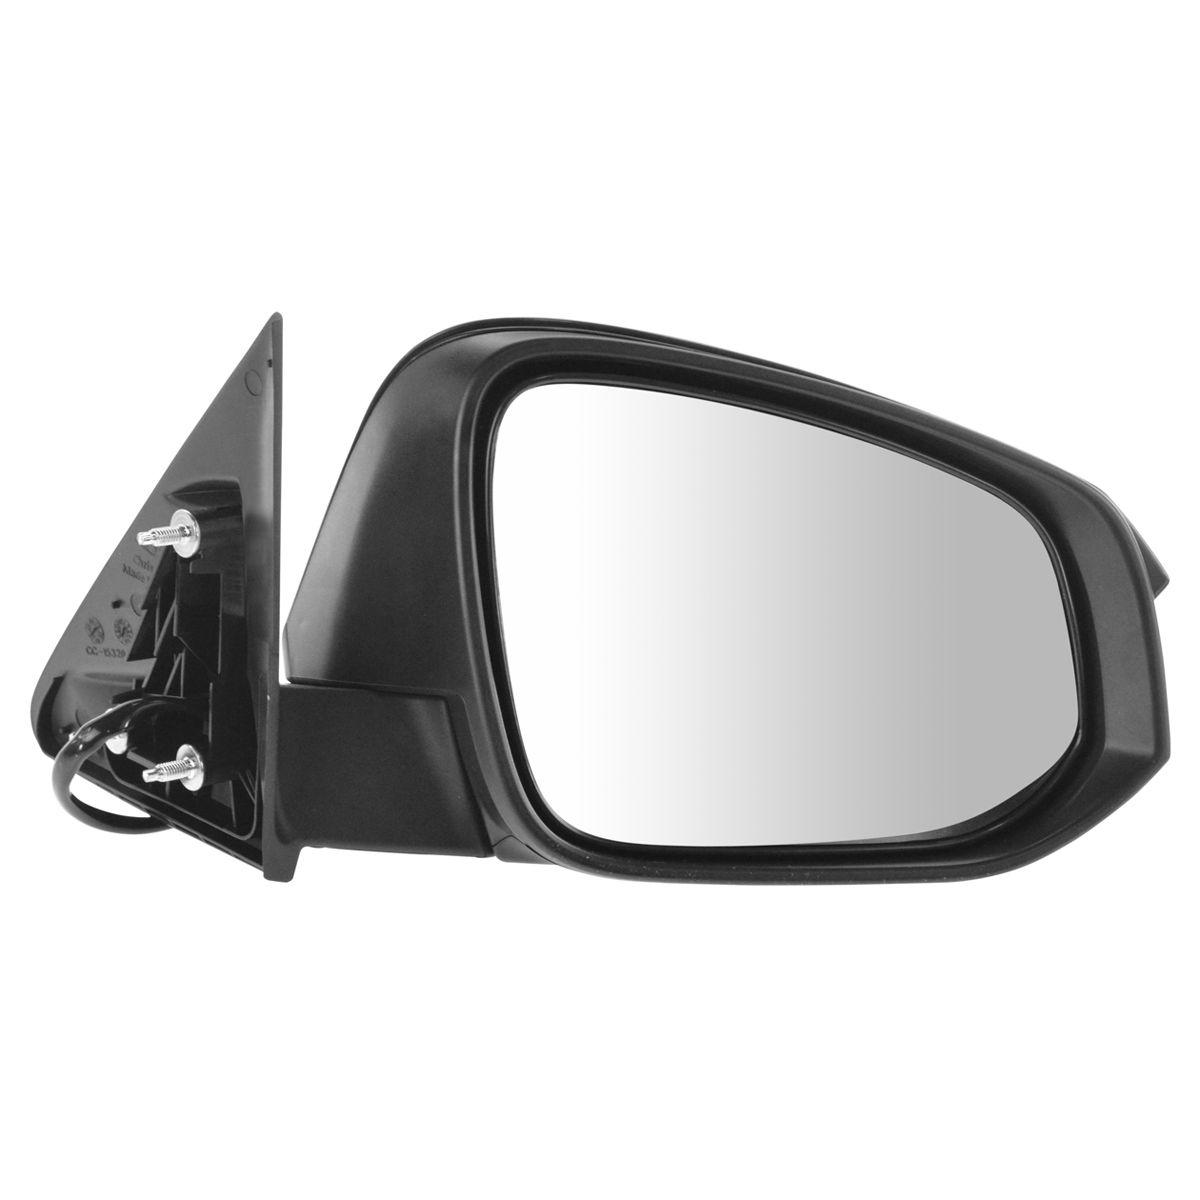 US Made Door Mirror Glass Driver Side For Toyota Highlander 2014-16